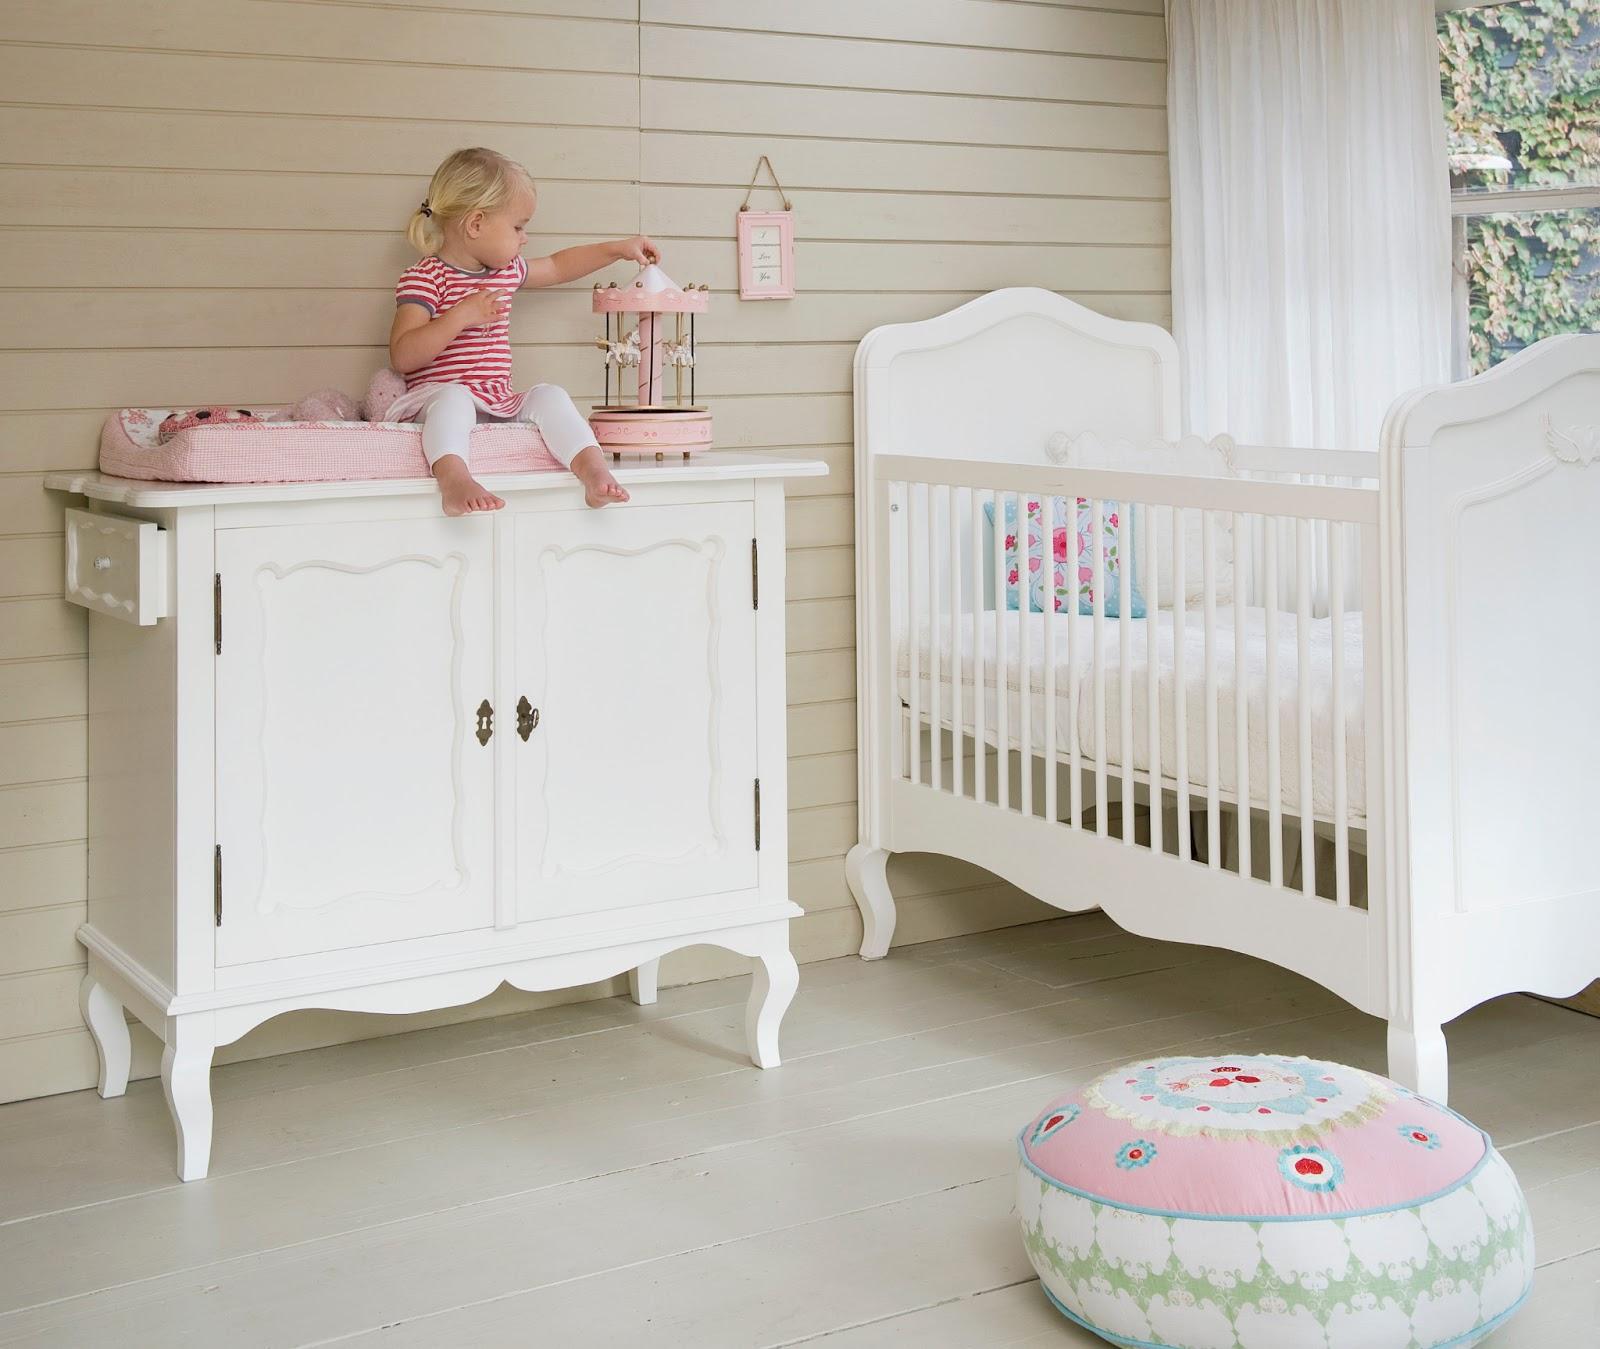 isossy children global fashion for global kids isossy children meets punkin patch interiors. Black Bedroom Furniture Sets. Home Design Ideas